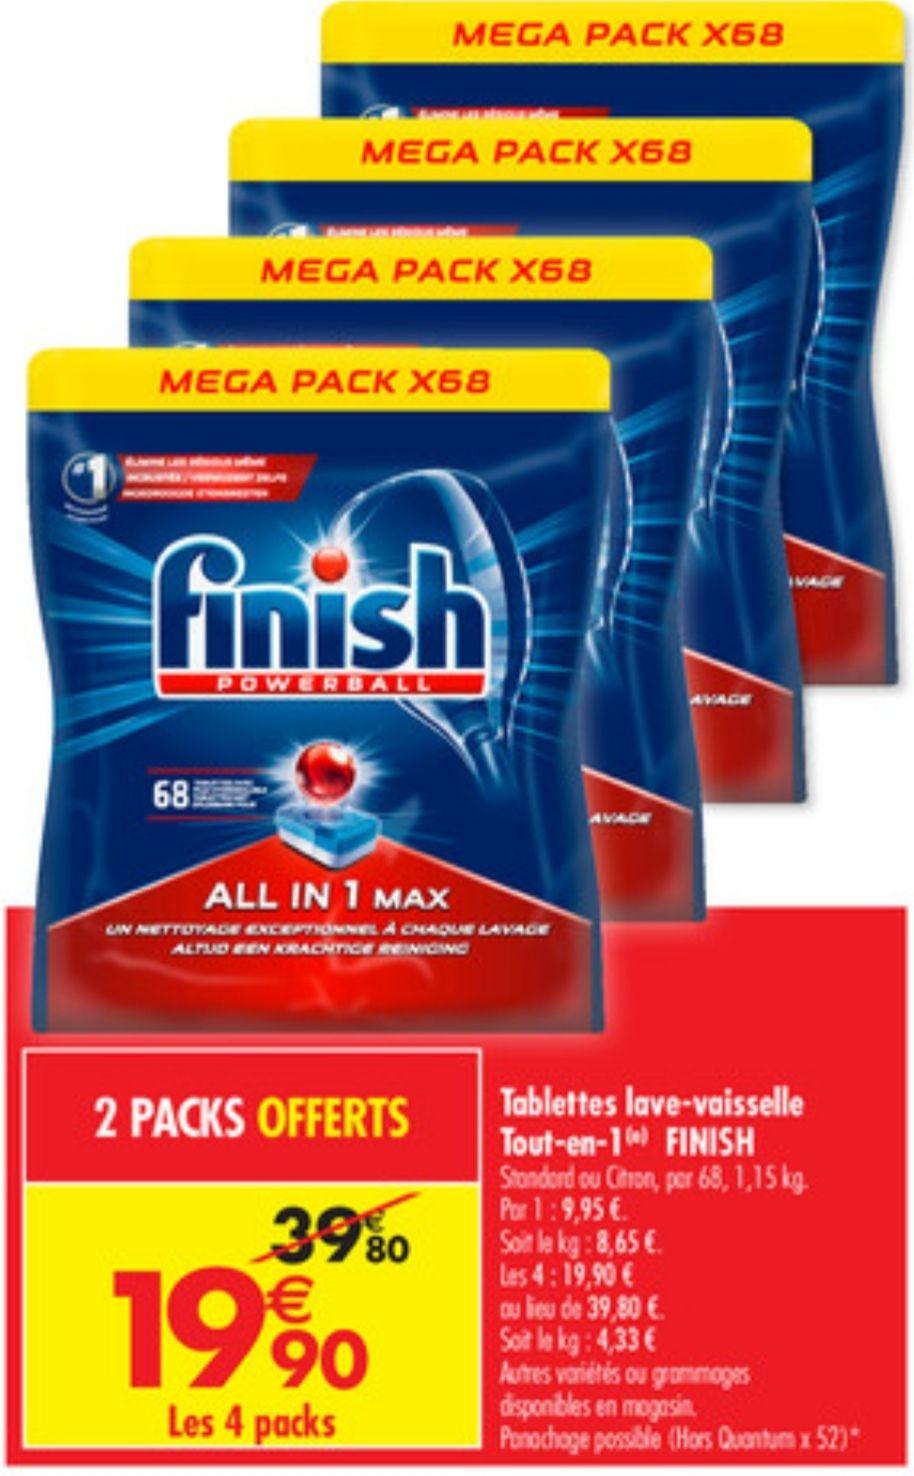 4 Mega Packs de 68 tablettes lave-vasselle Finish Powerball All In 1 Max Classic ou Citron - Soit 272 tablettes